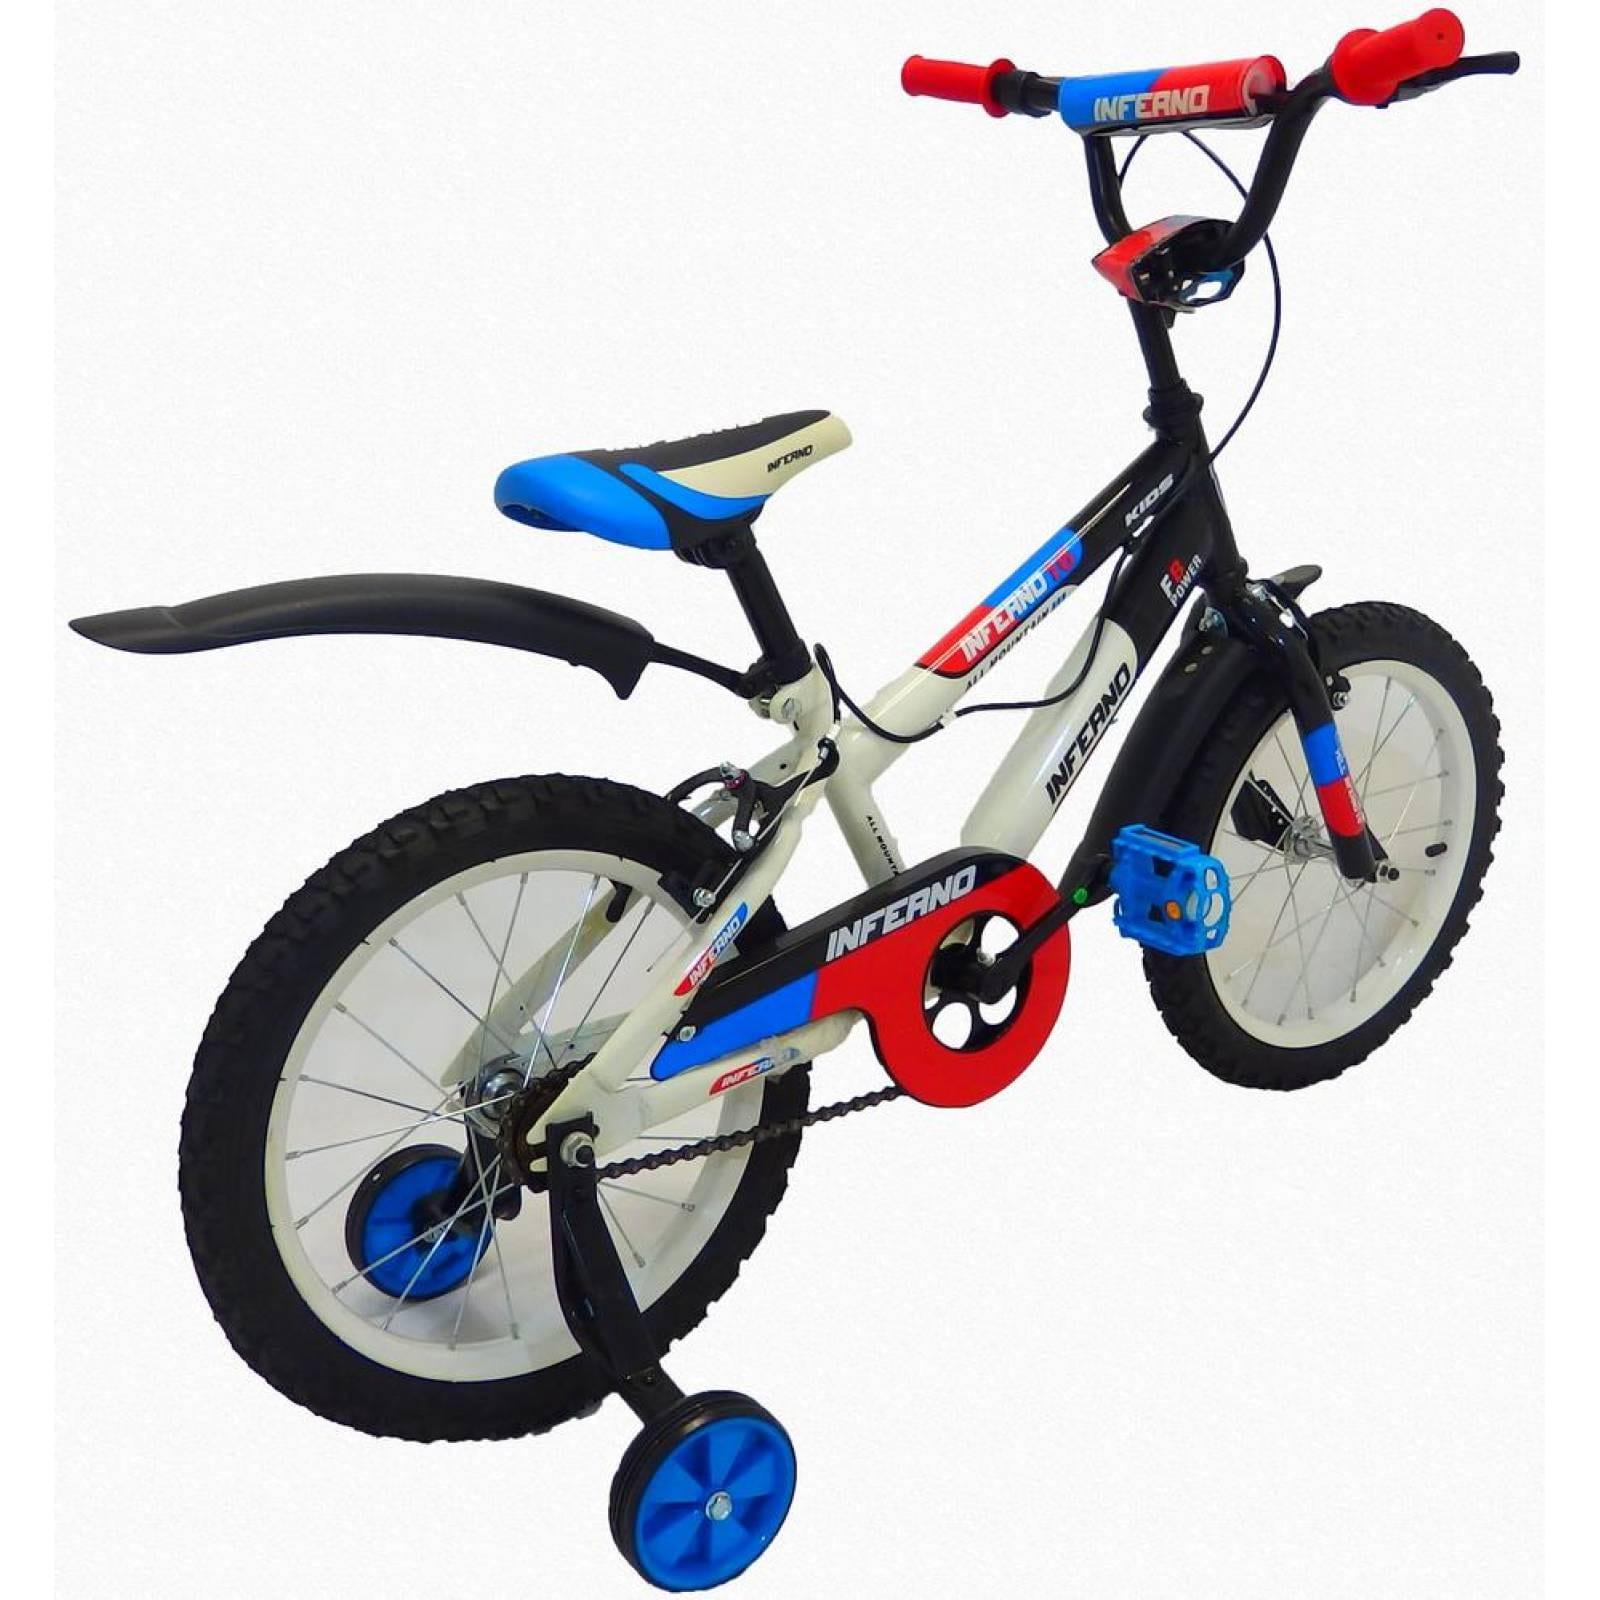 Bicicleta Infantil para niño rodada 16 Inferno Blanco